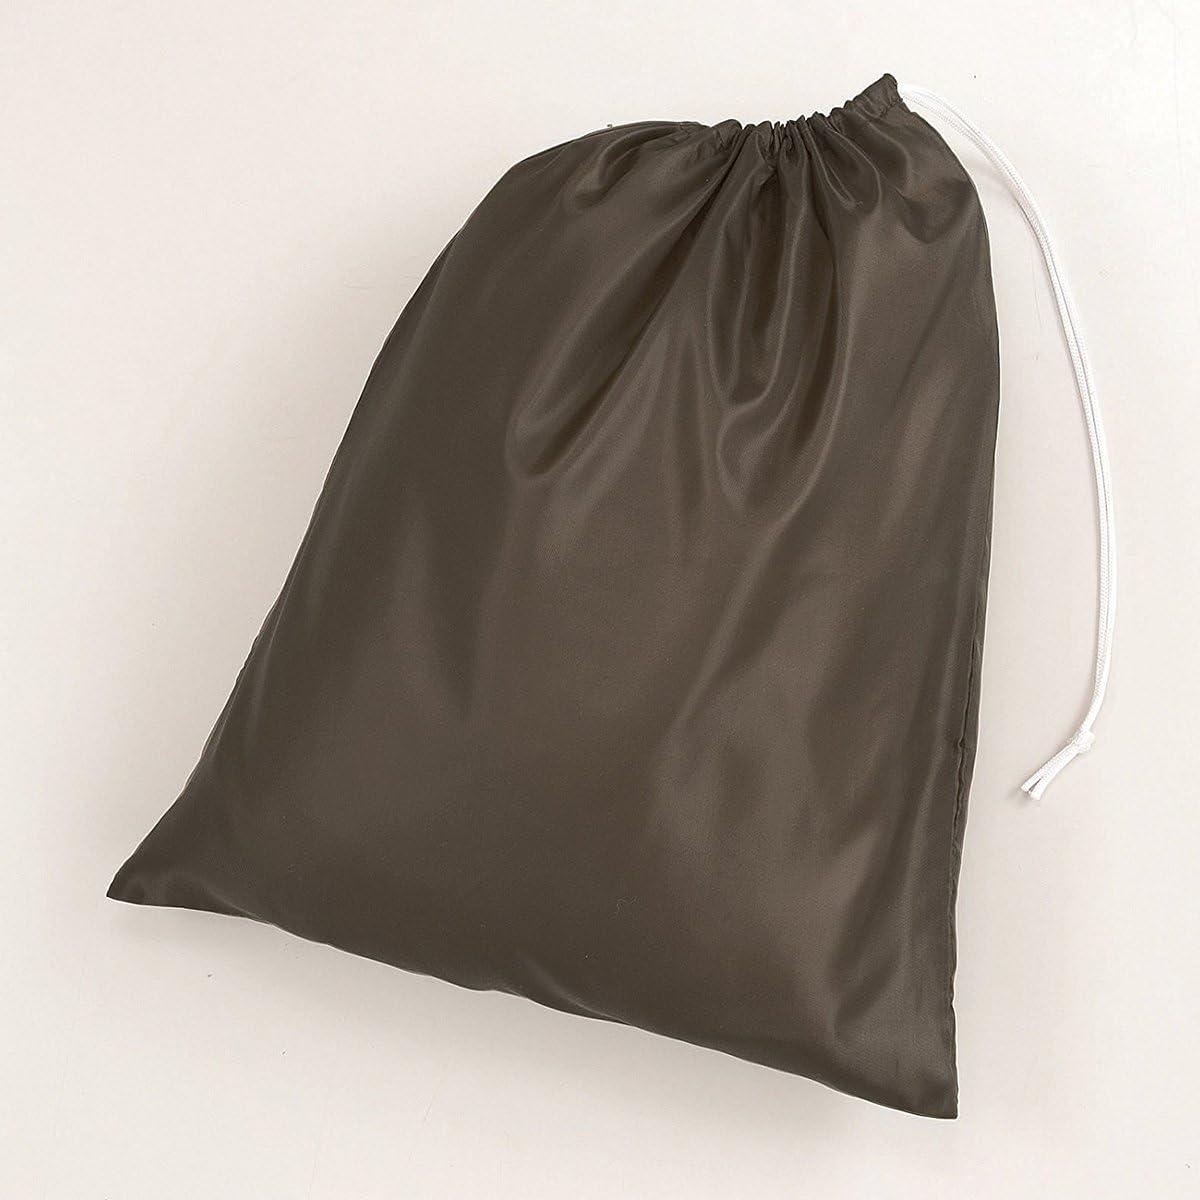 Hair Cutting Cape Adult Foldable Hair Cutting Cloak Umbrella for Salon Barber Special Hair Styling Accessory (Khaki)